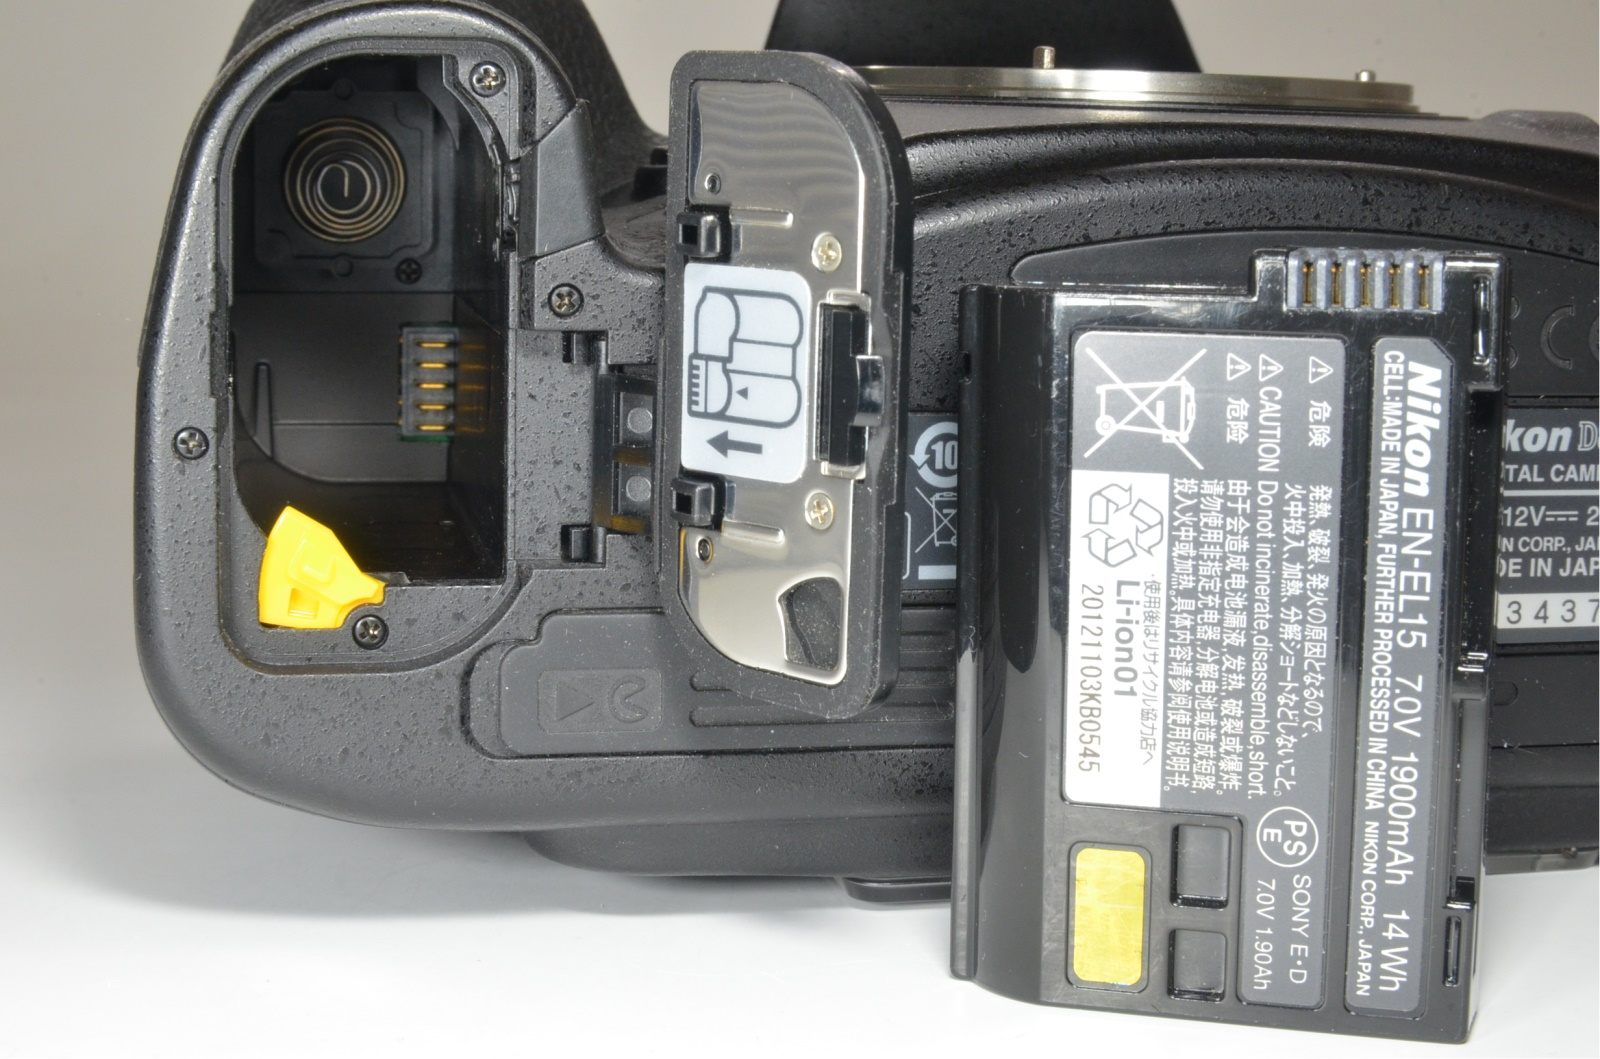 nikon d800 36.3mp digital slr camera body shutter count 9040 from japan